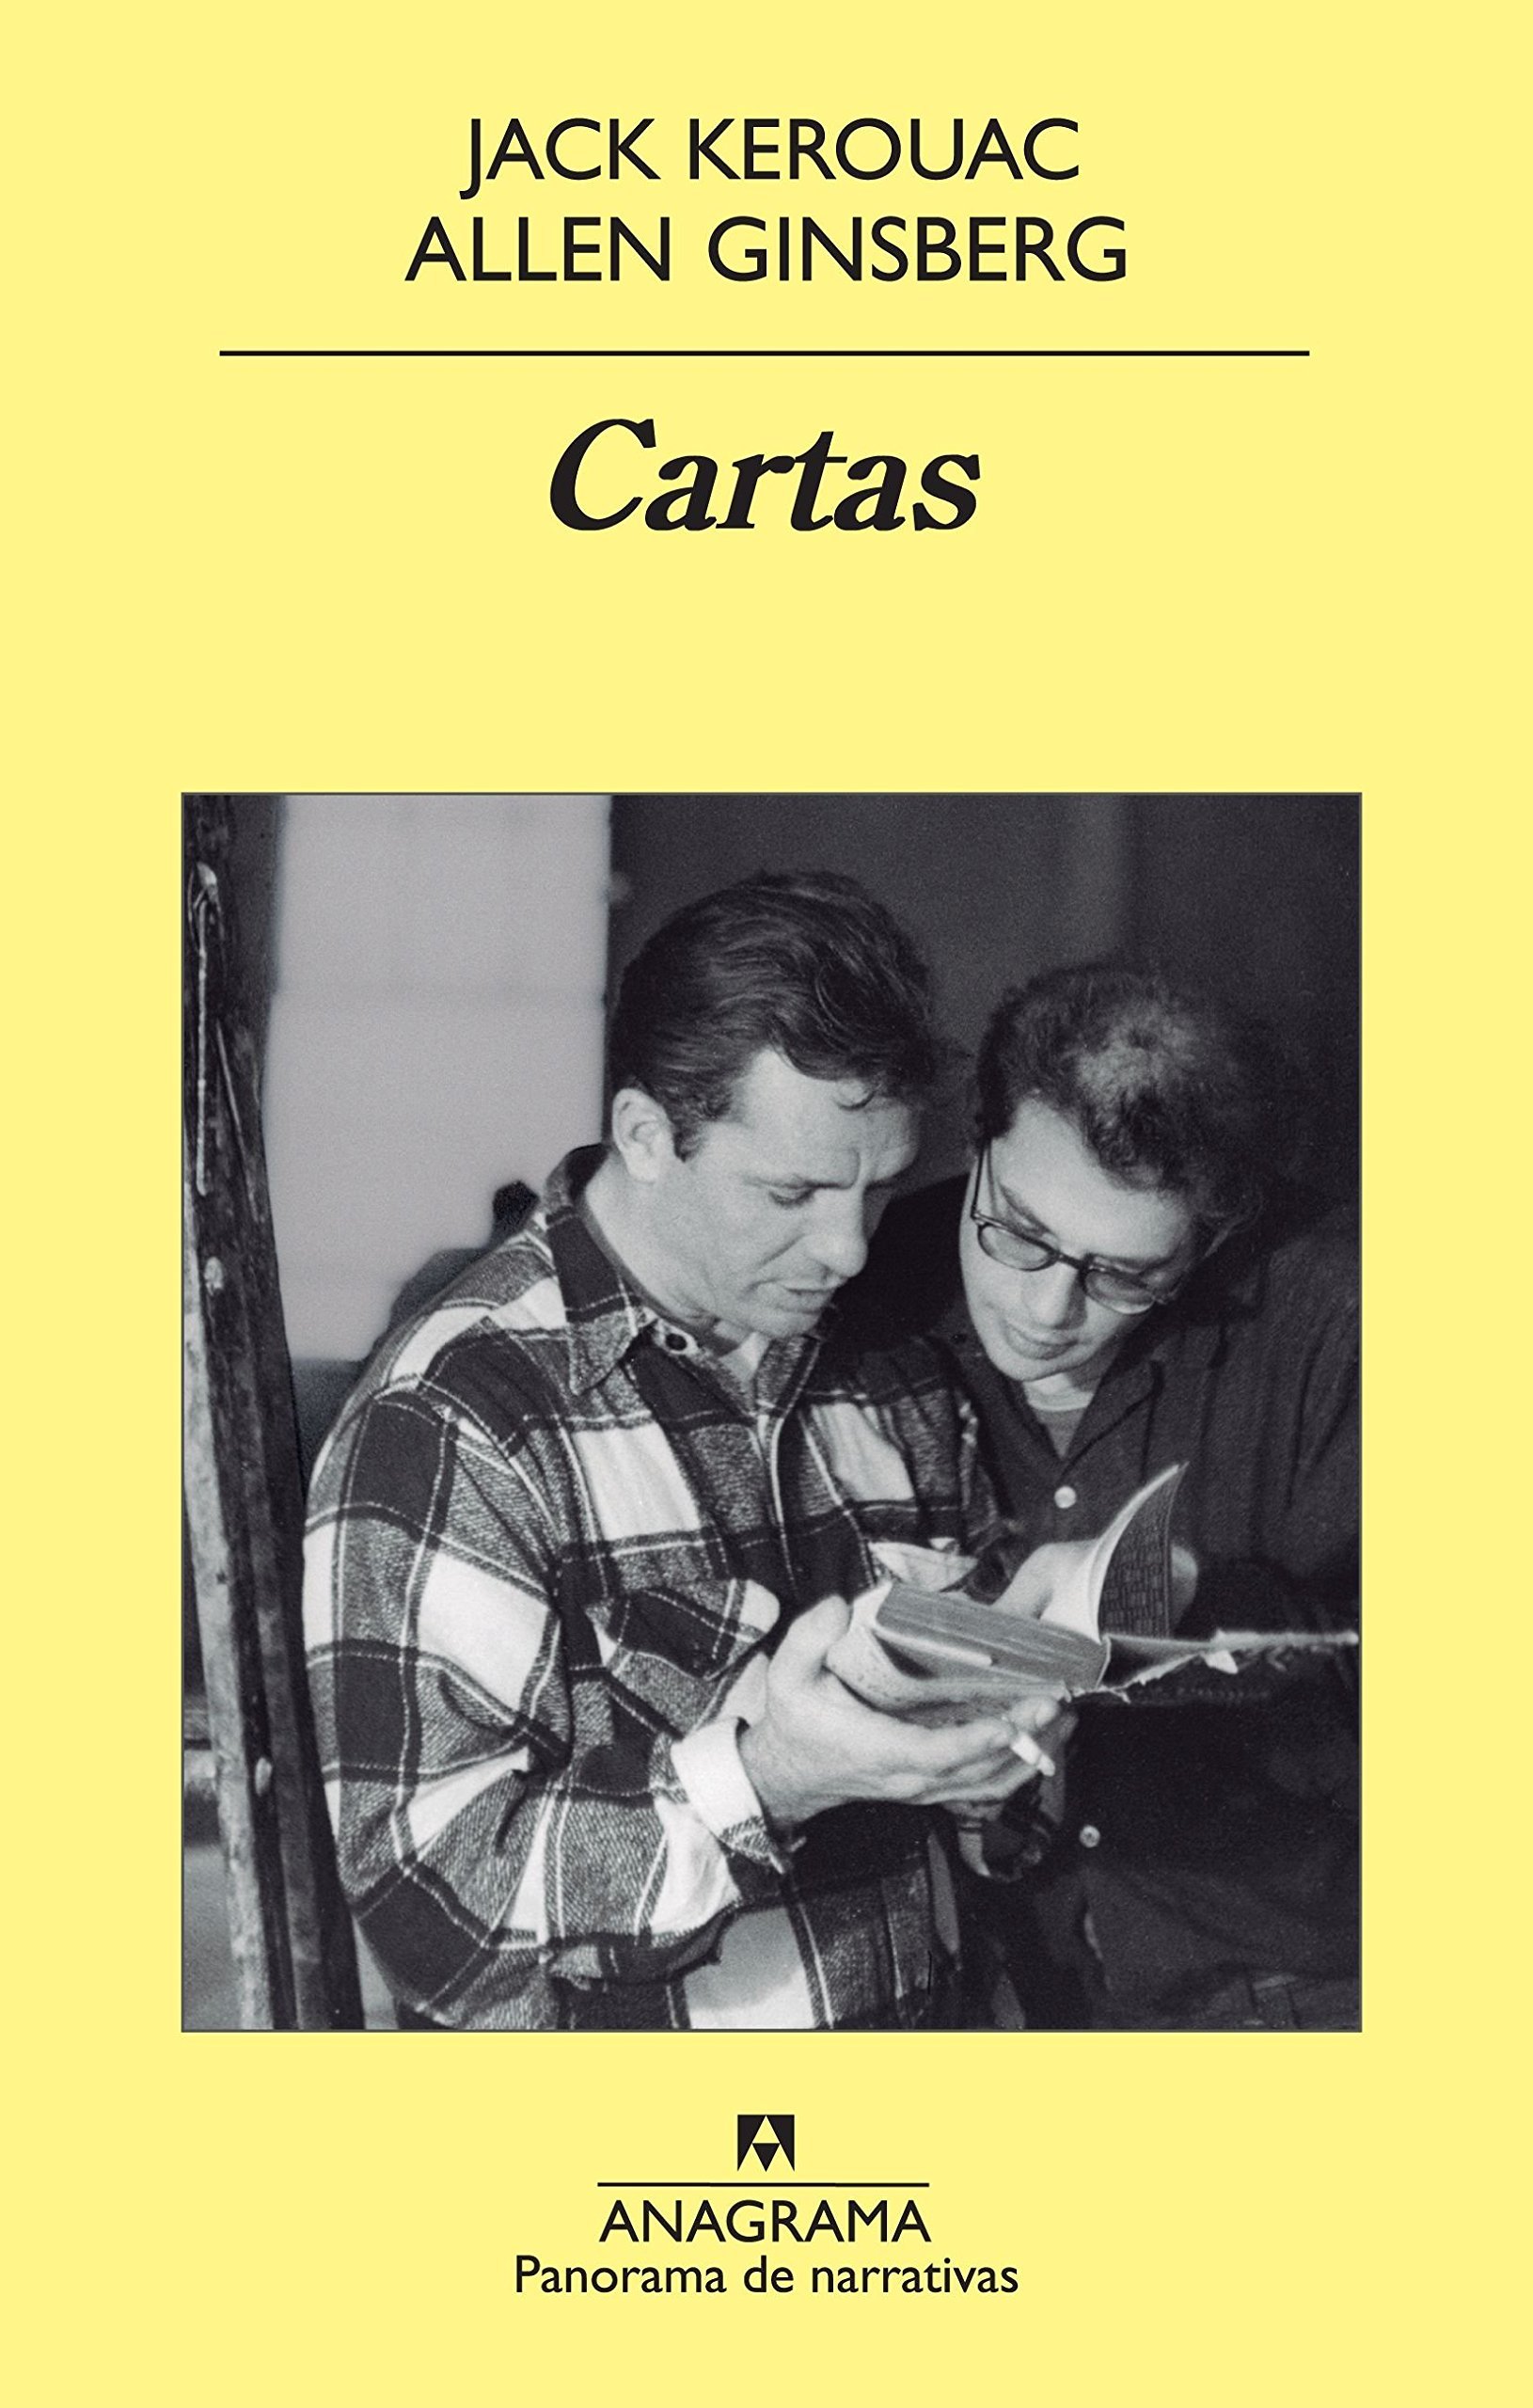 Cartas (Panorama de narrativas) Tapa blanda – 10 may 2012 Jack Kerouac Allen Ginsberg Bill Morgan David Stanford